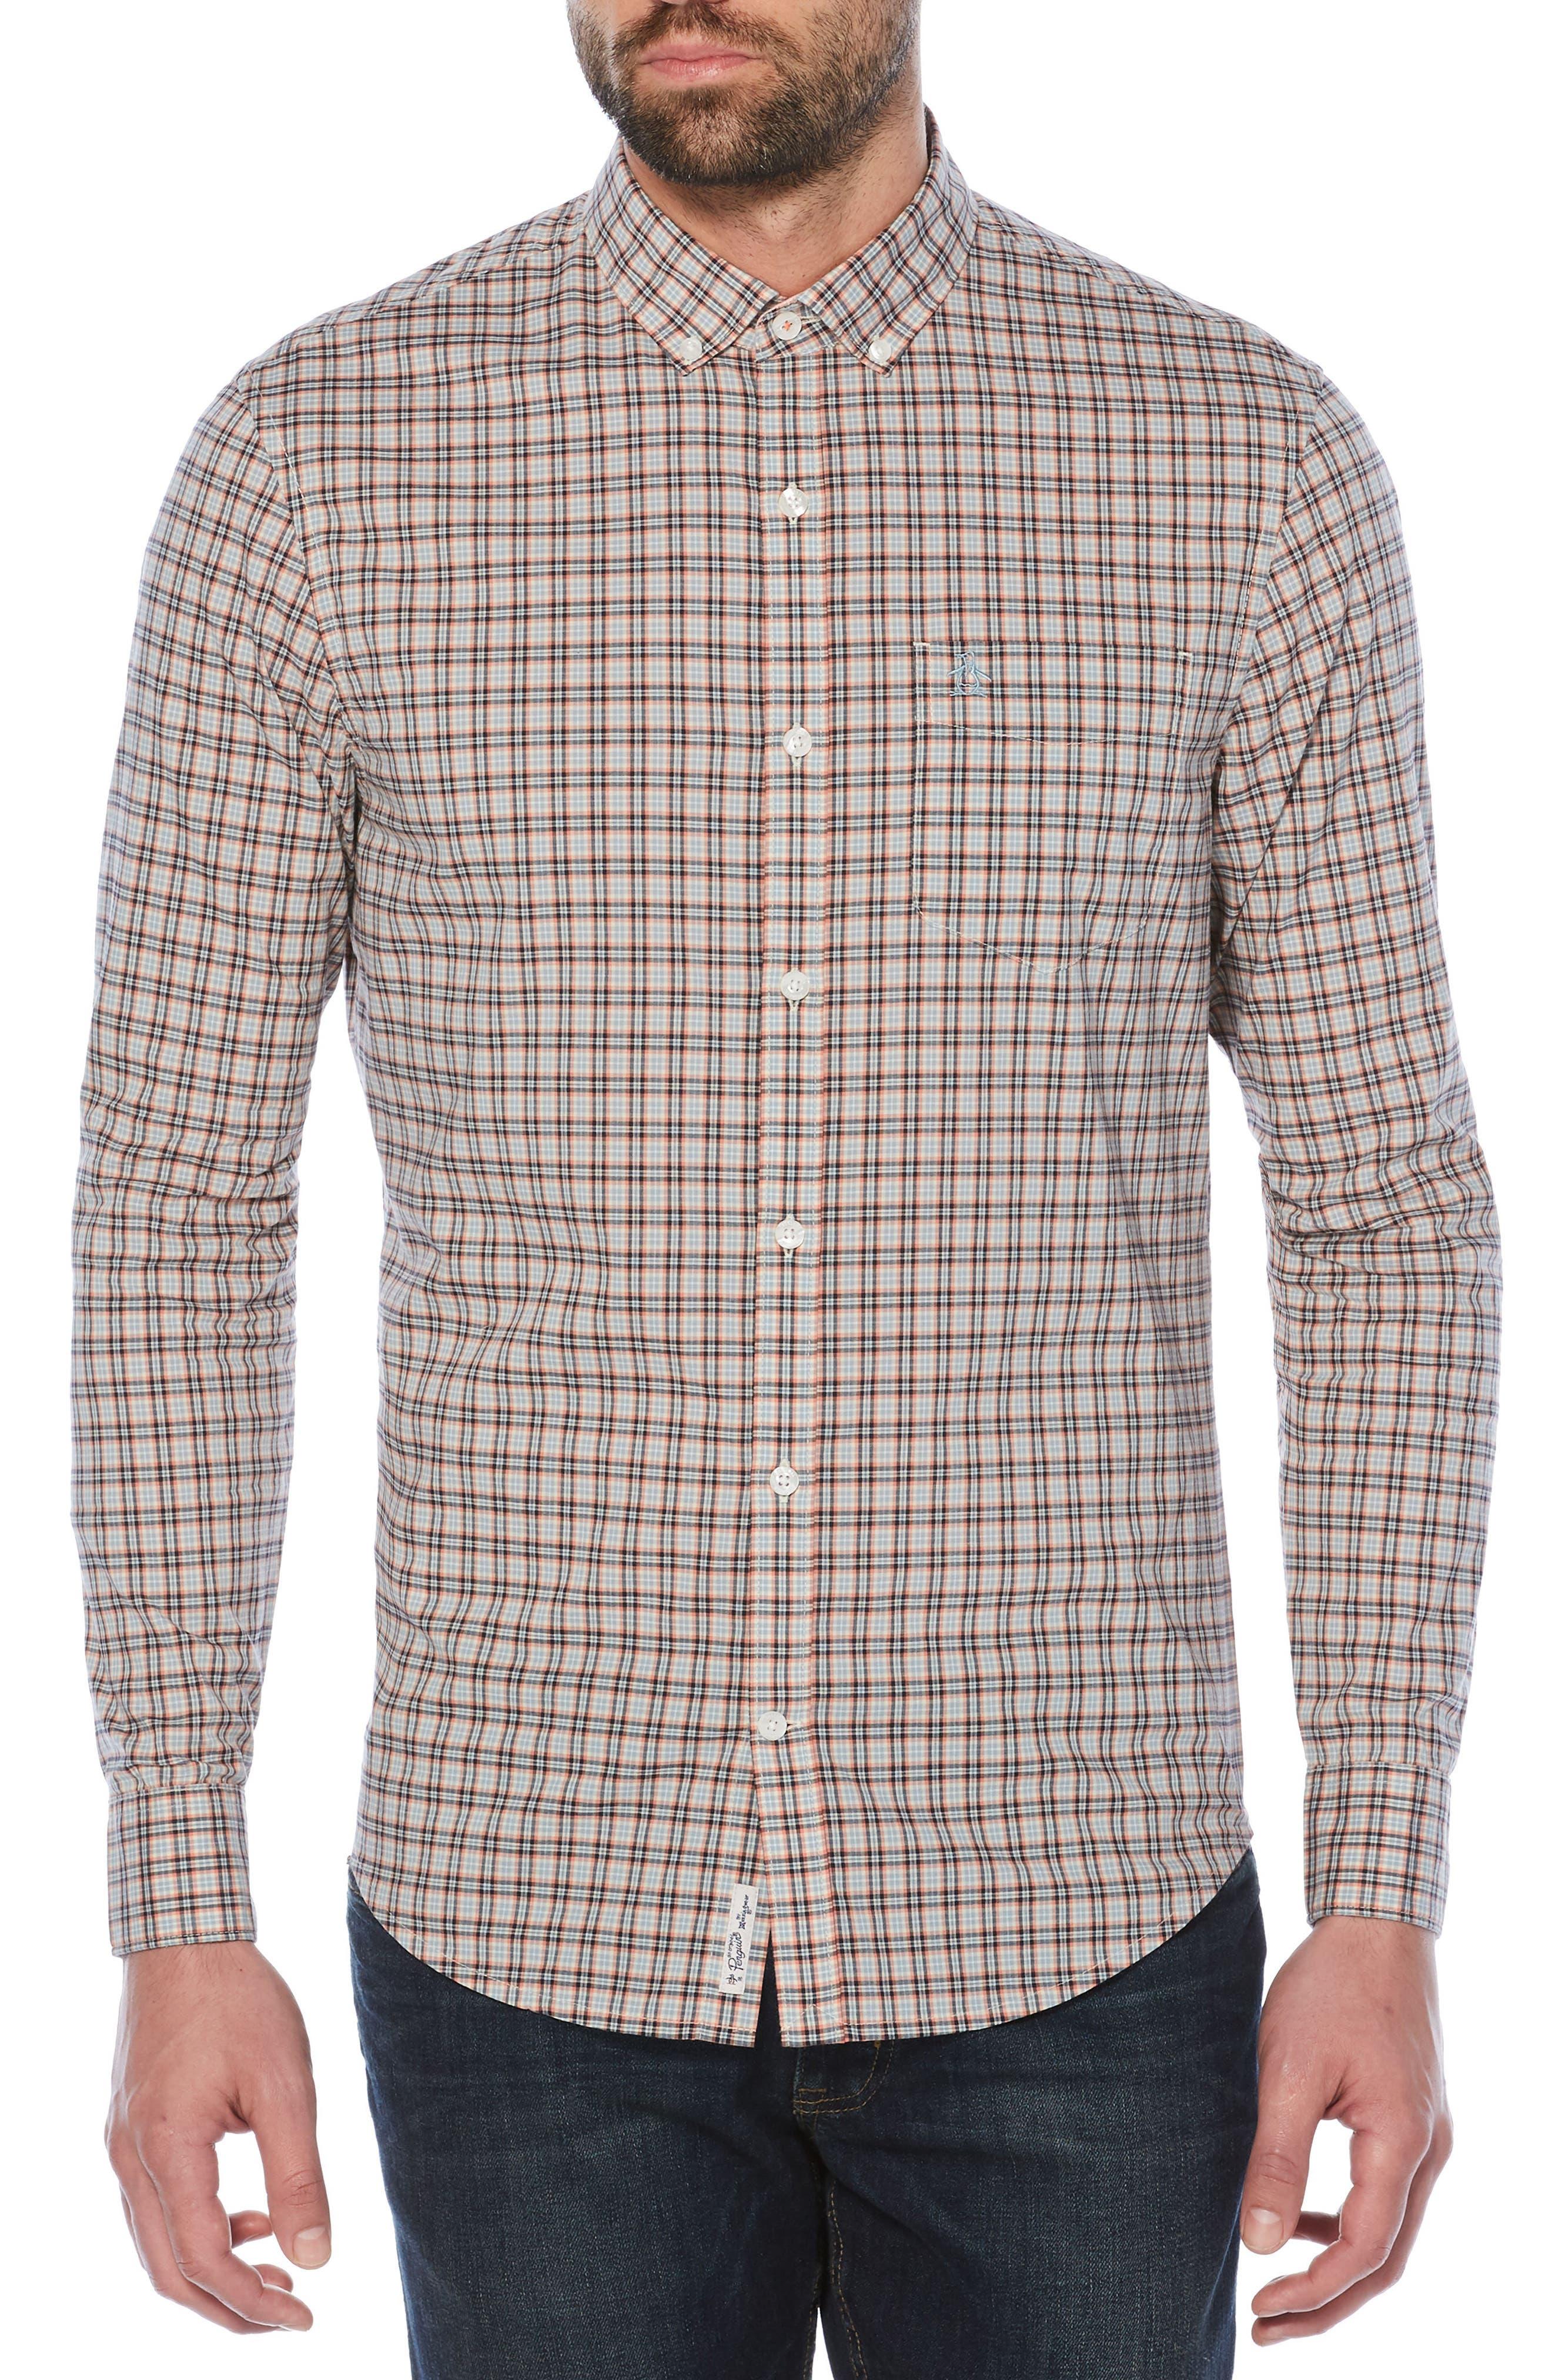 P55 Plaid Shirt,                         Main,                         color, Crabapple